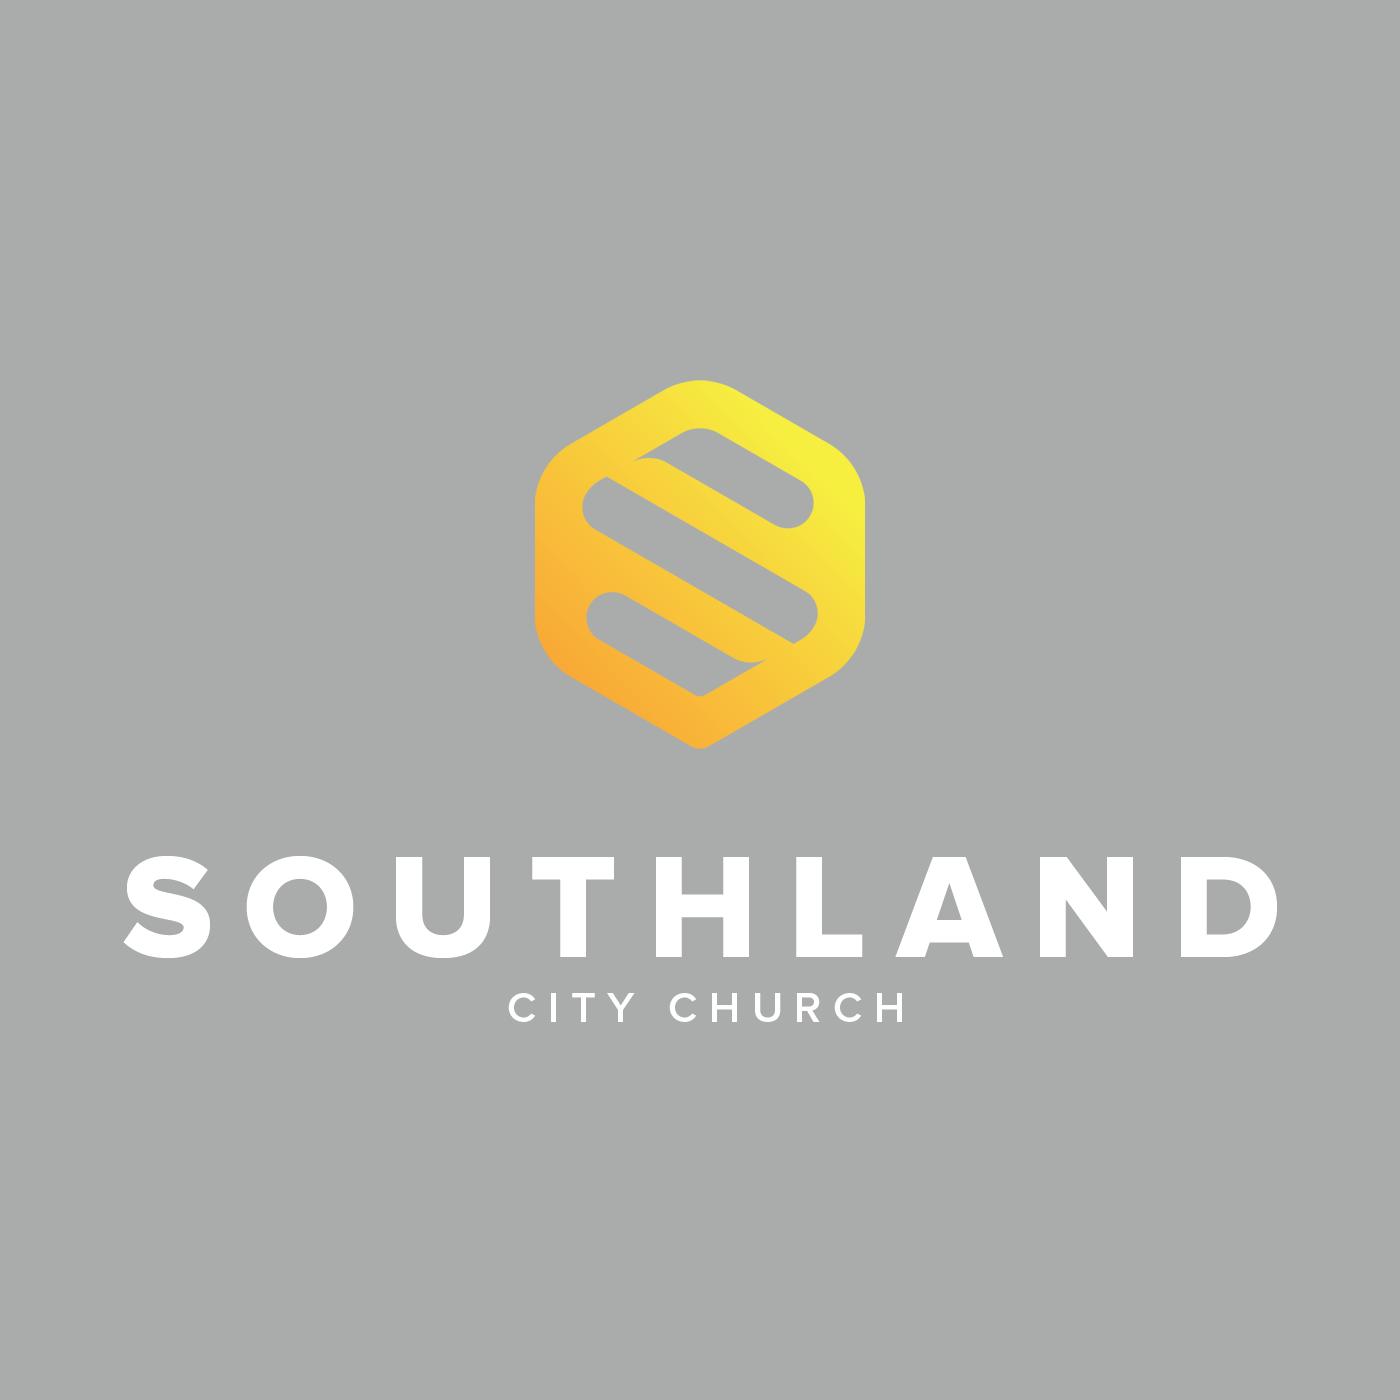 Southland City Church - Southland City Church